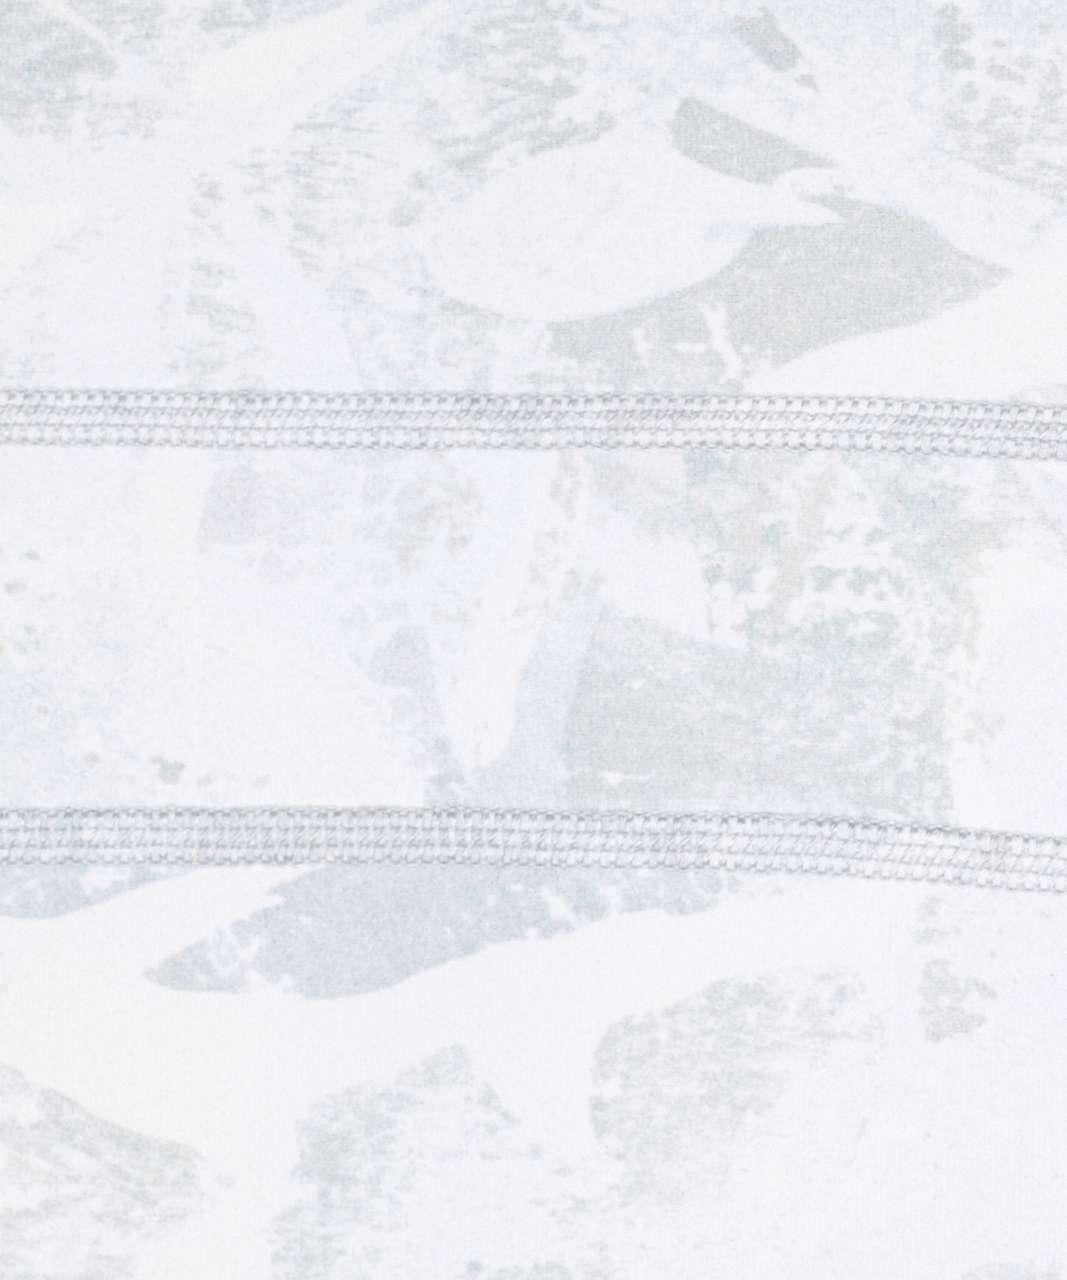 Lululemon Define Jacket - Tropical Shadow Starlight Multi